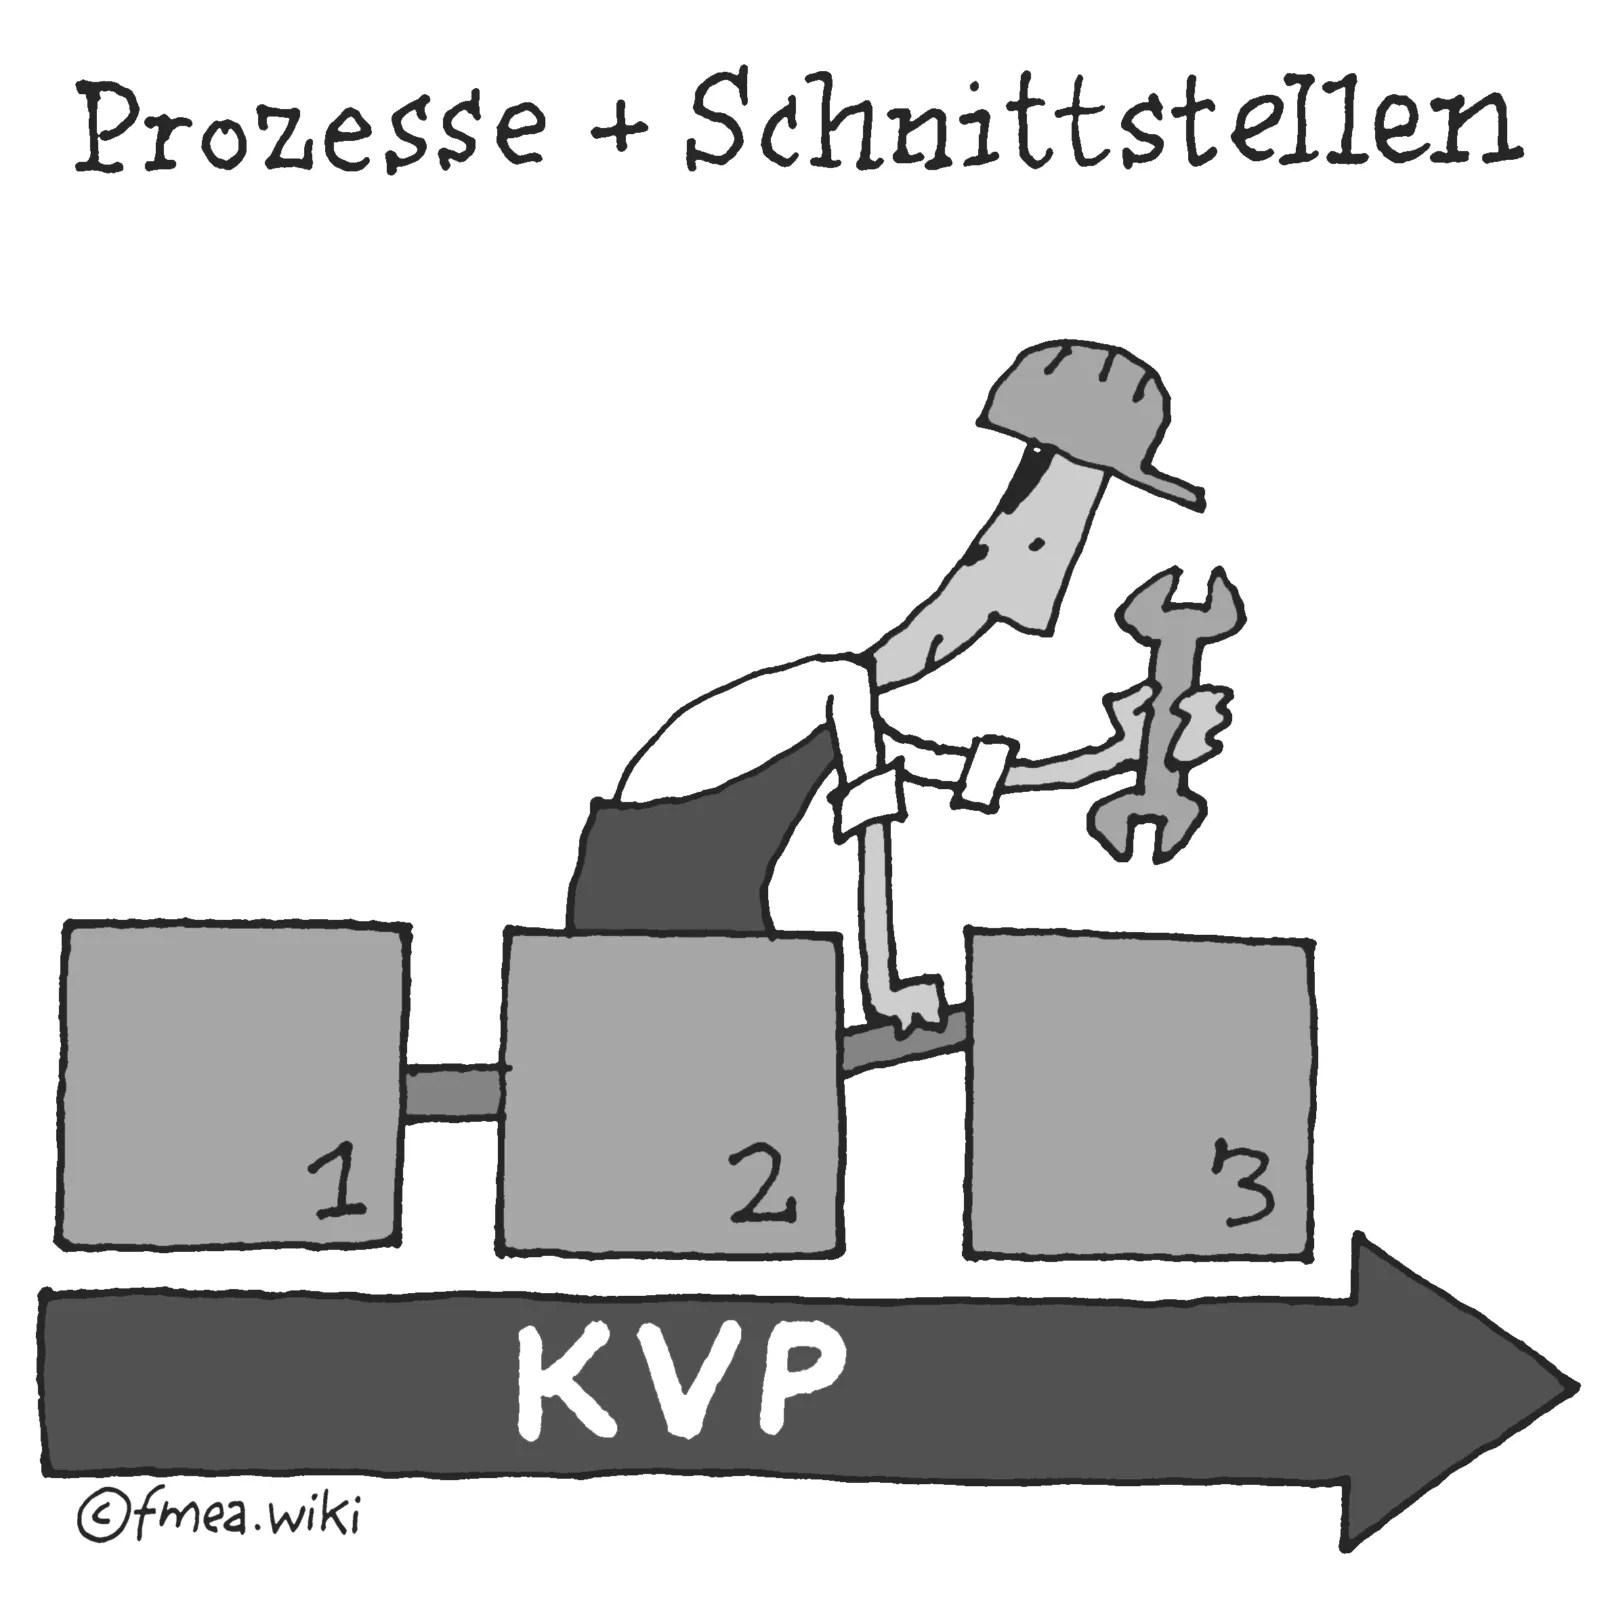 KVP Prozesse